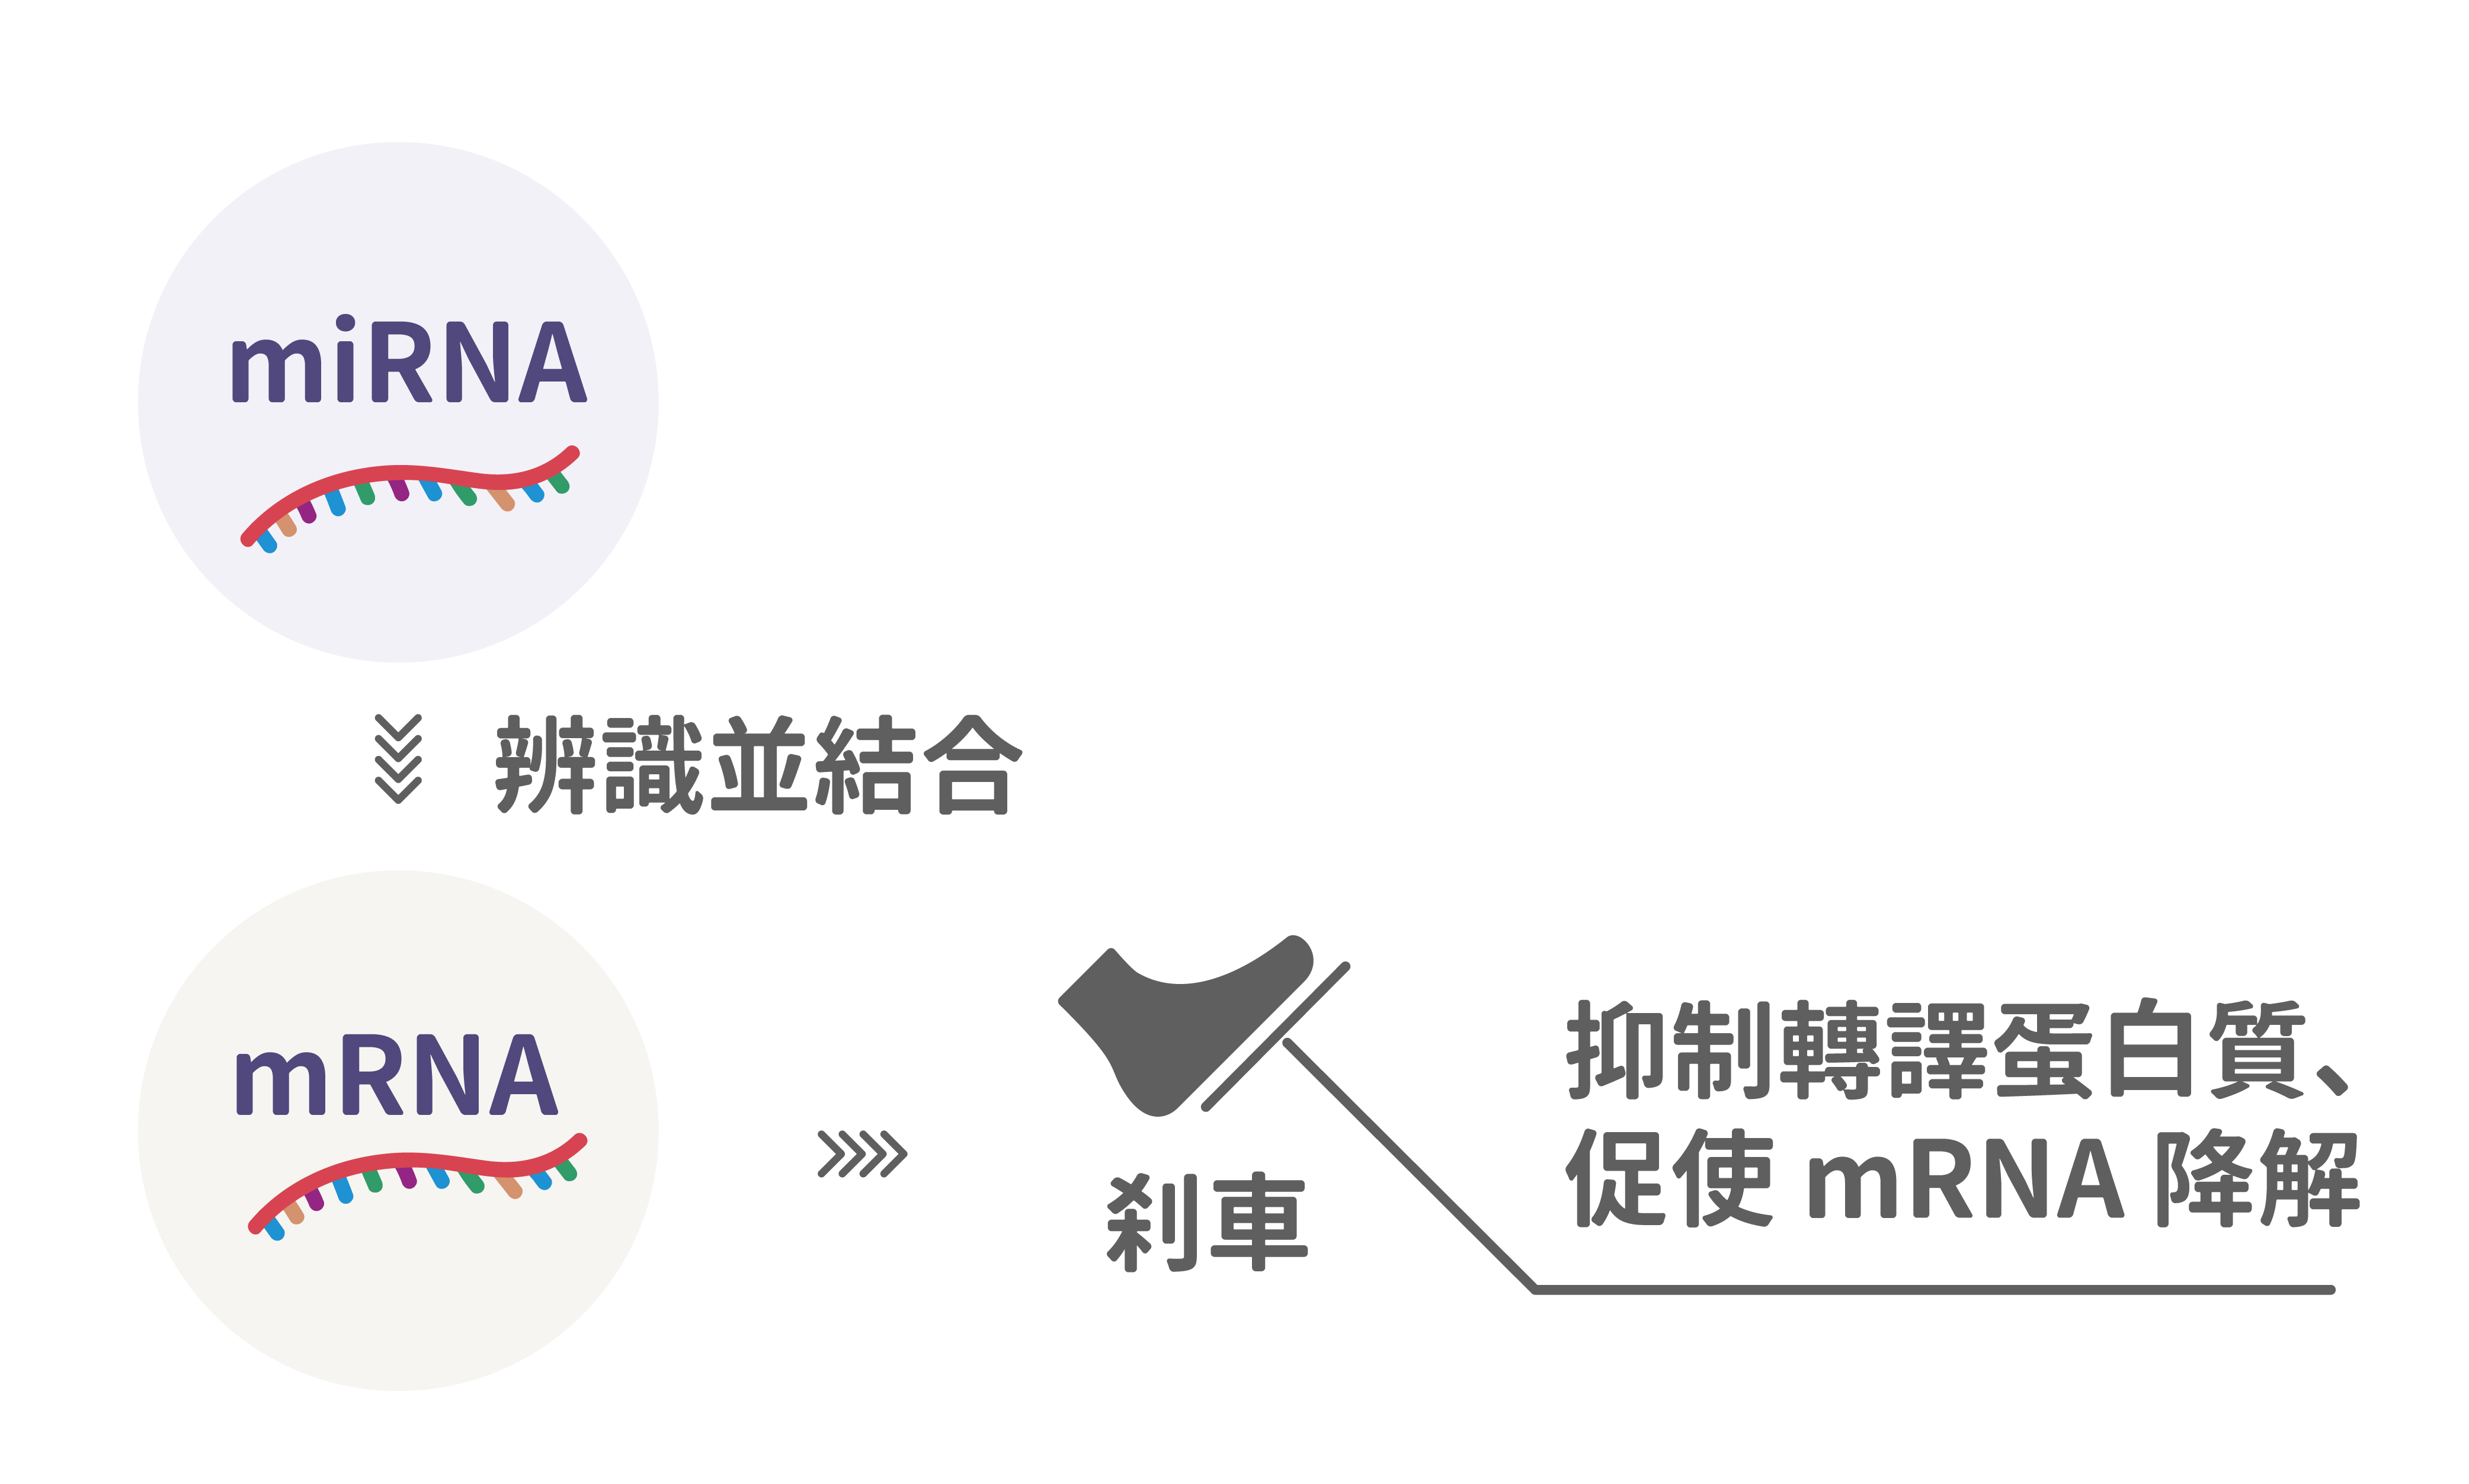 miRNA 彷彿在幫 mRNA 踩剎車,暫停後續轉譯蛋白質,藉此調控基因表現。圖│研之有物